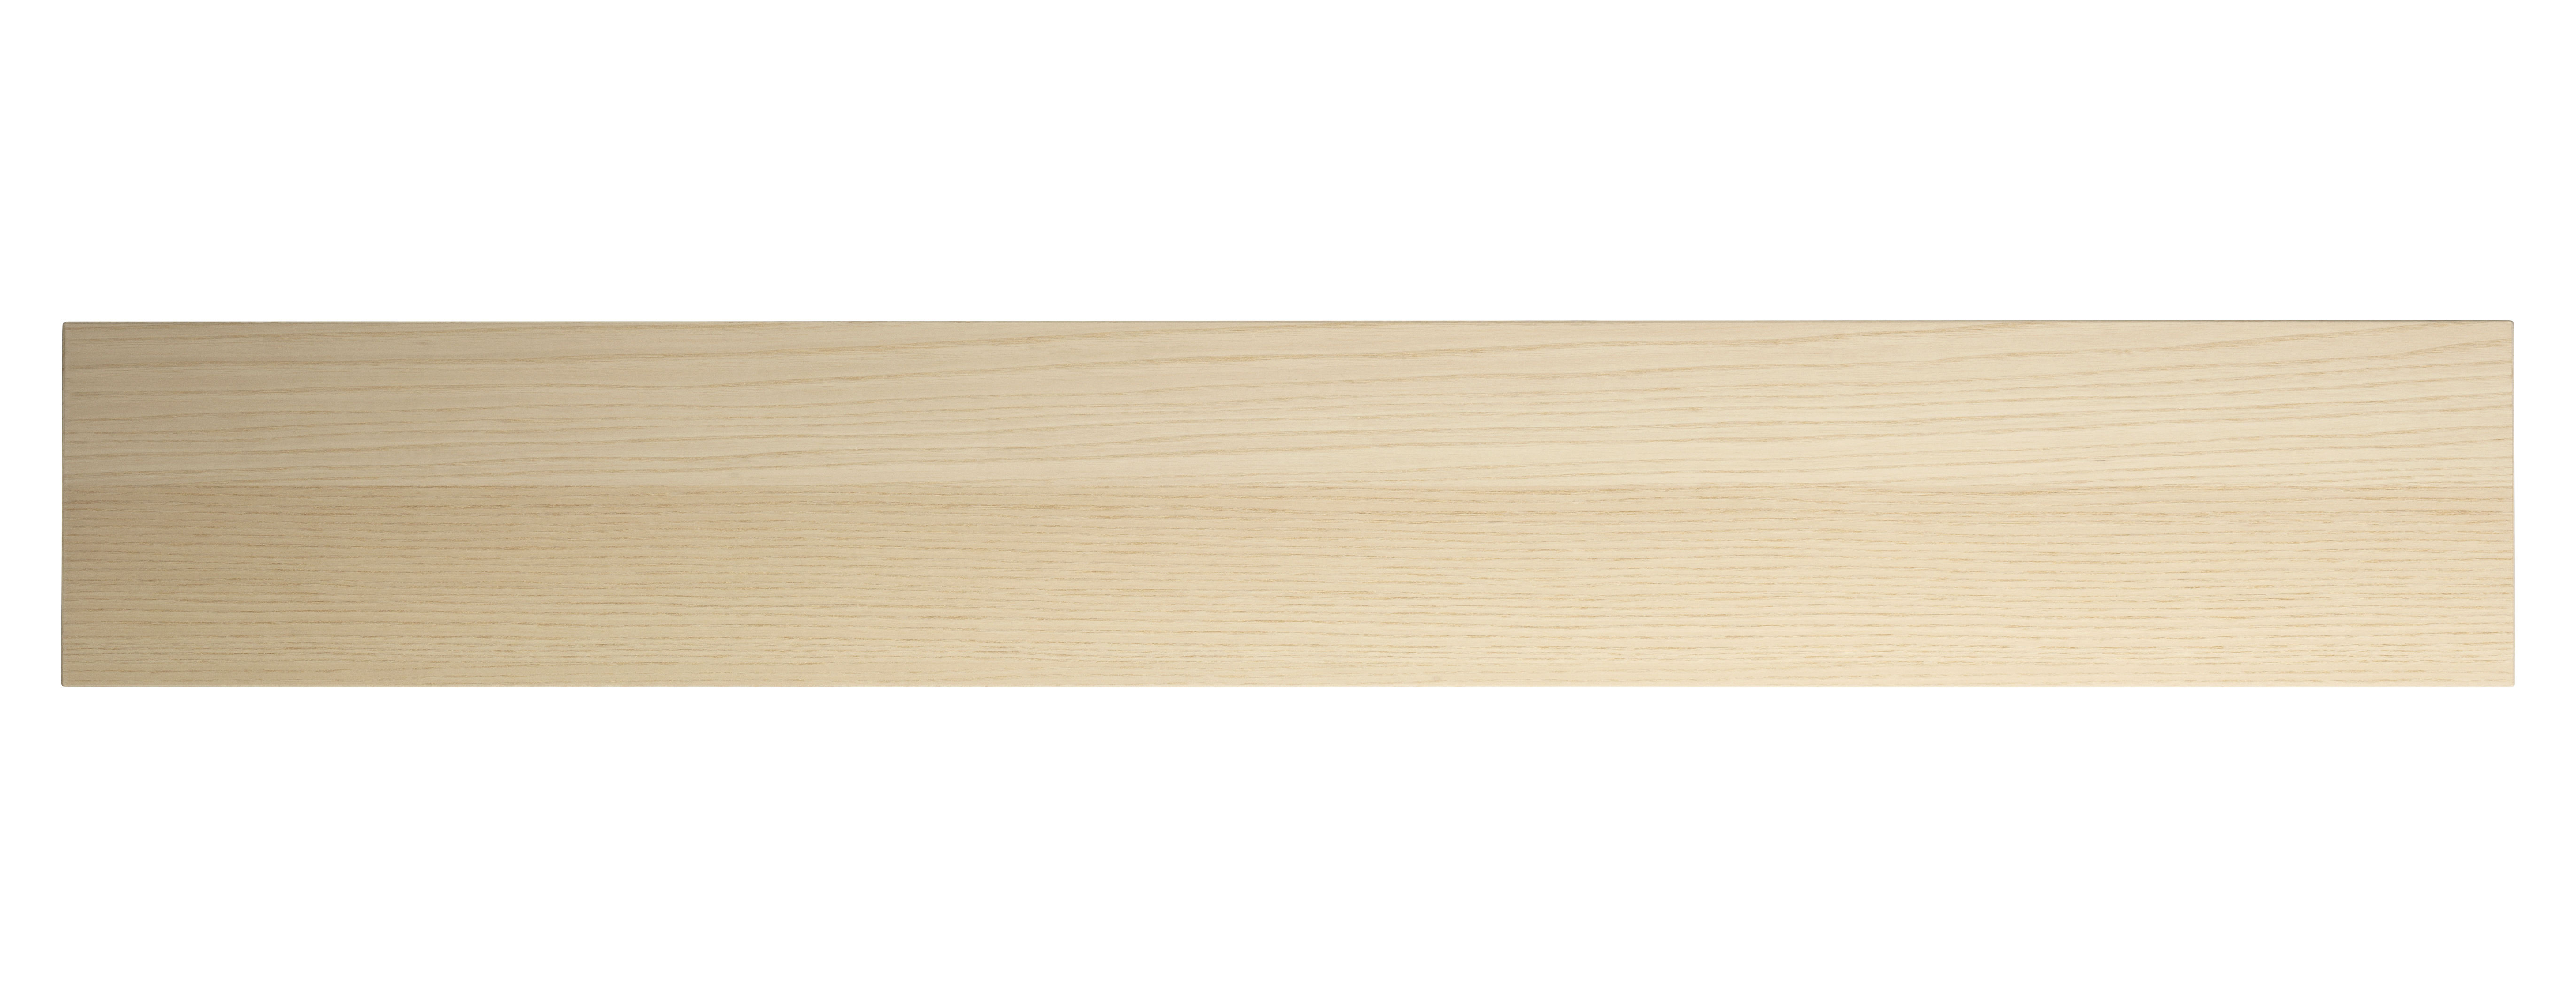 Mobilier - Etagères & bibliothèques - Etagère Plio Chêne - L 160 cm / Pour montants Plio - Presse citron - Chêne - Chêne massif